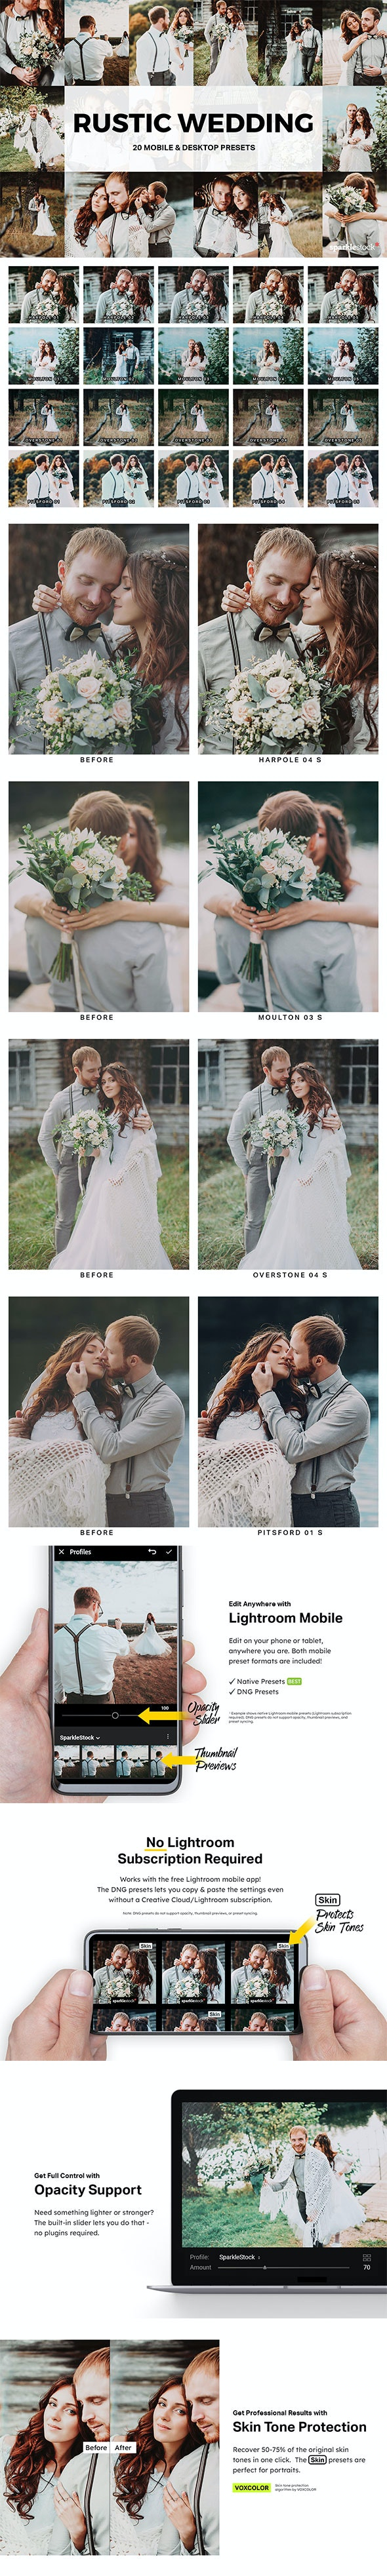 20 Rustic Wedding Lightroom Presets and LUTs - Wedding Lightroom Presets